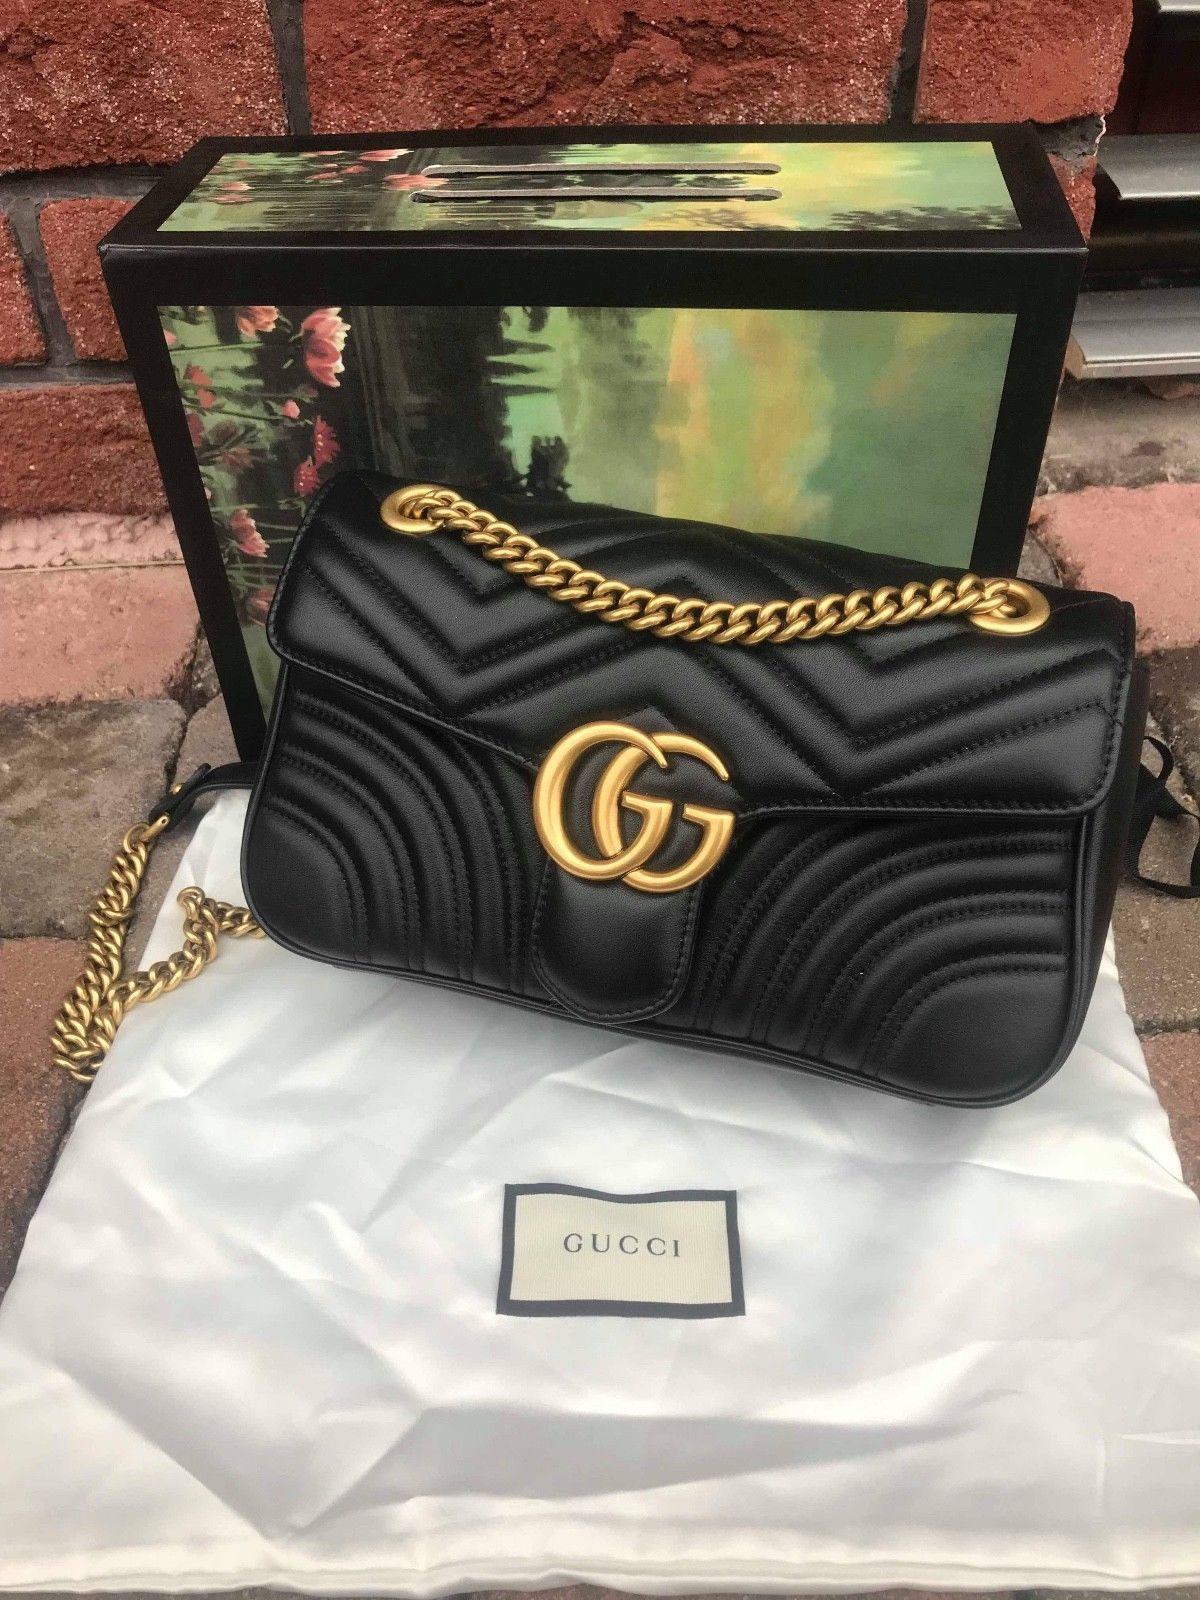 6c2ce4037aa7 Authentic Gucci GG Marmont Matelasse Leather Mini Shoulder Crossbody Bag |  eBay